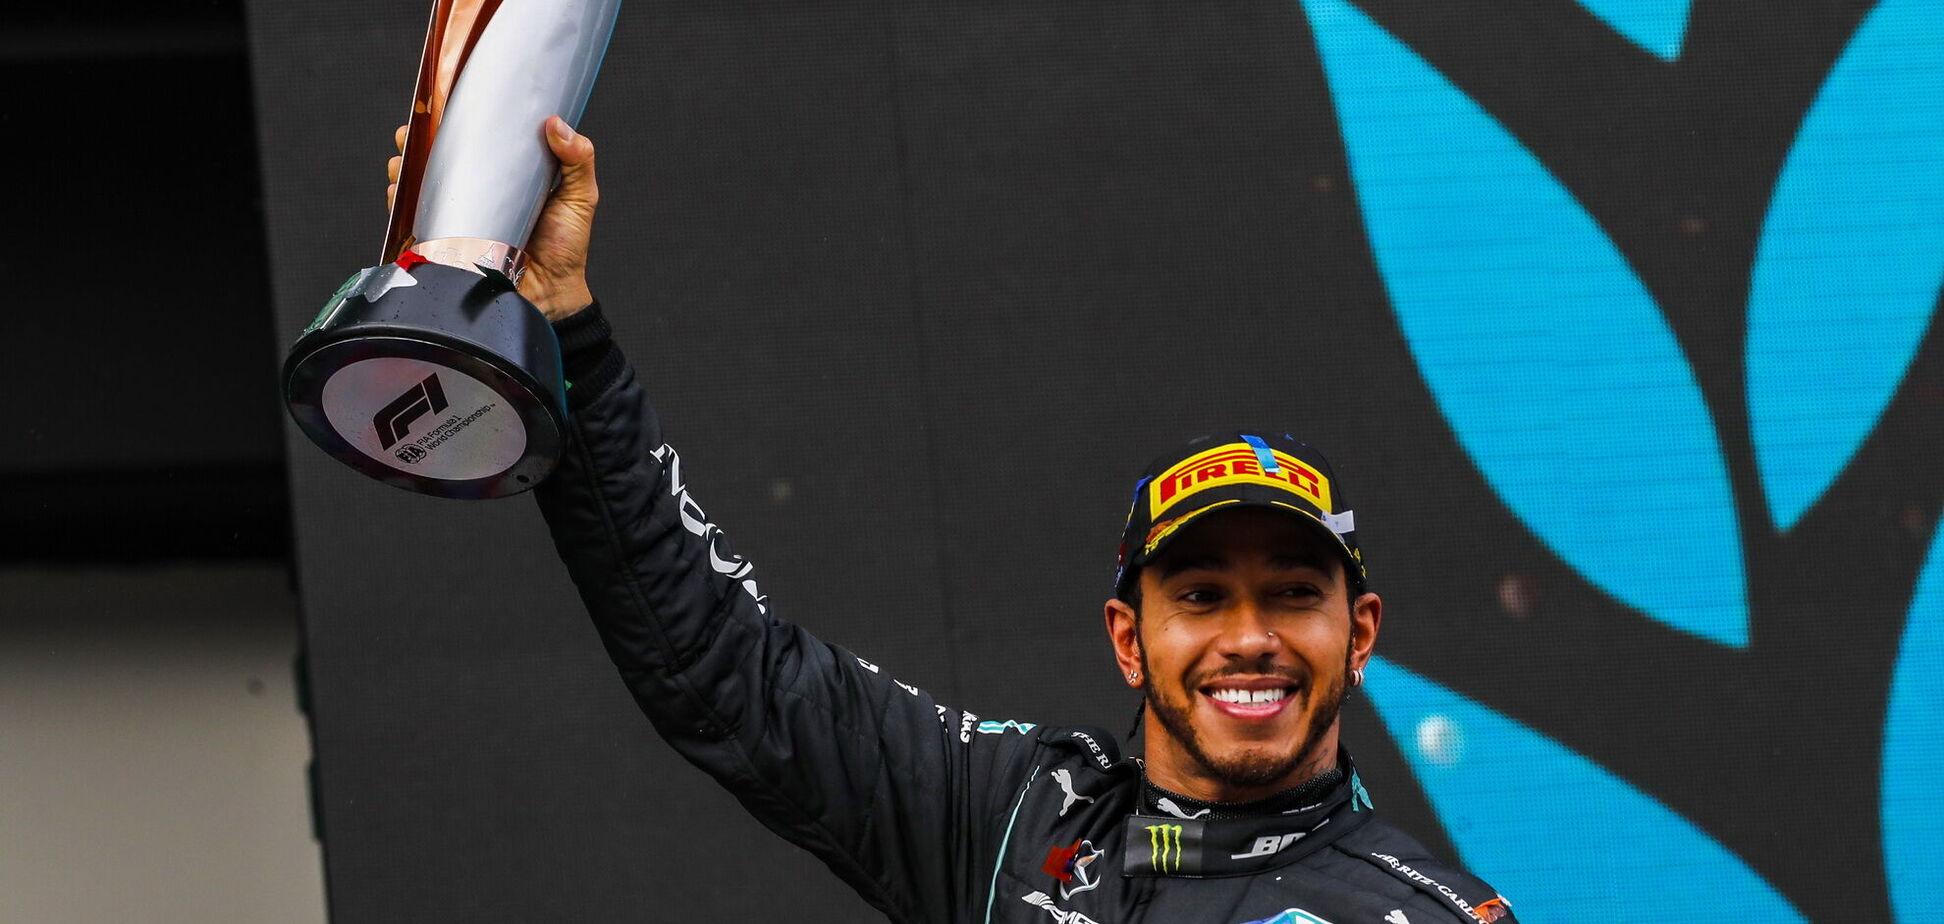 Гонщика F1 Льюїса Хемілтона посвятили у лицарі